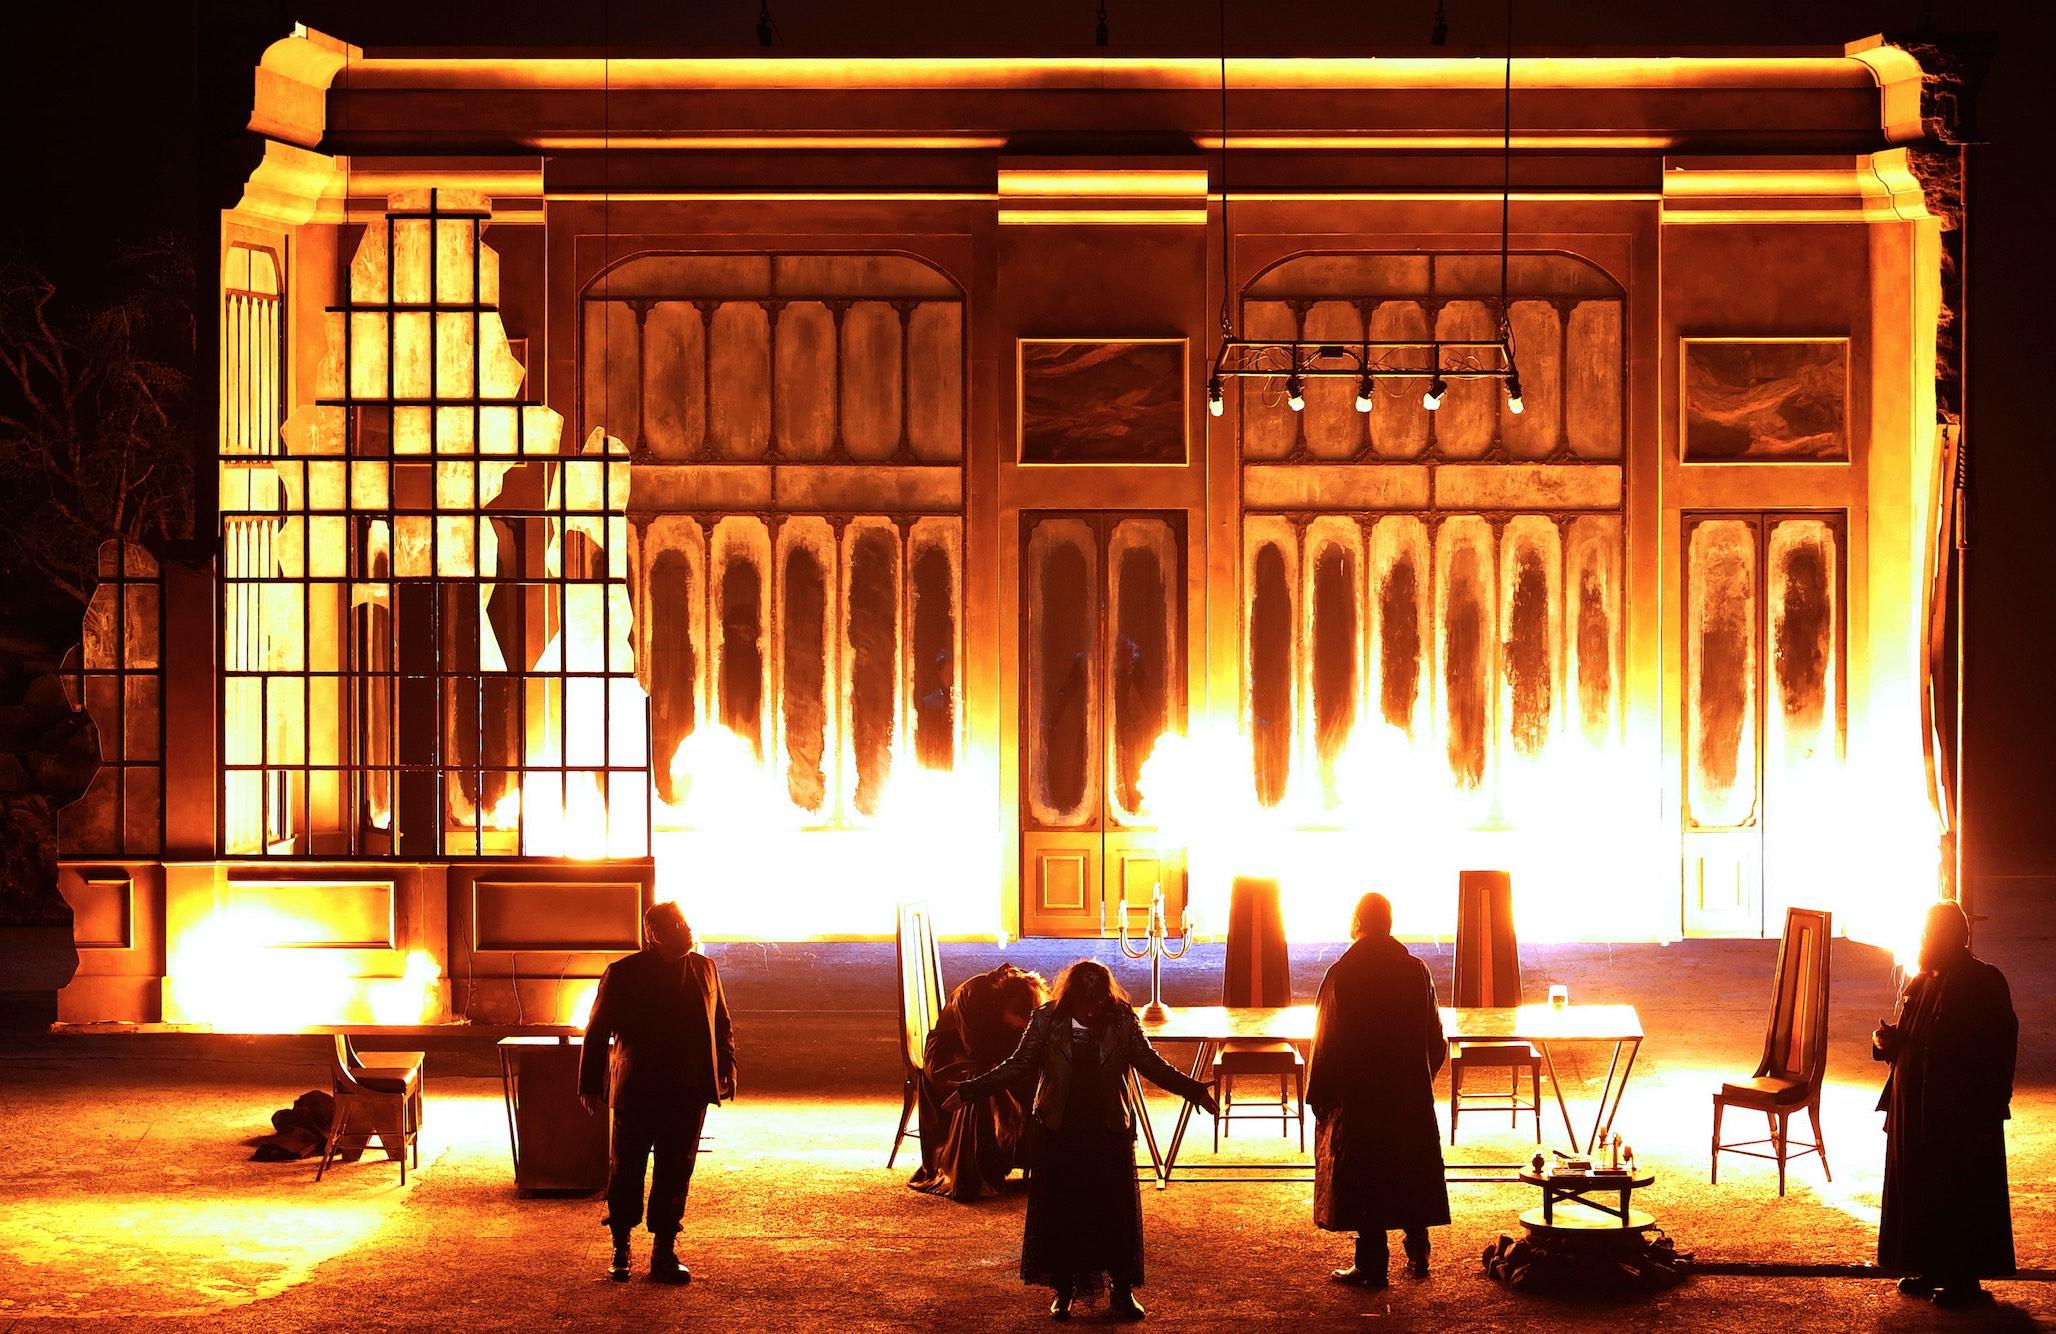 Chovanščina; Teatro alla Scala; Valery Gergiev; Musorgskij; Mario Martone; Milano; Opera